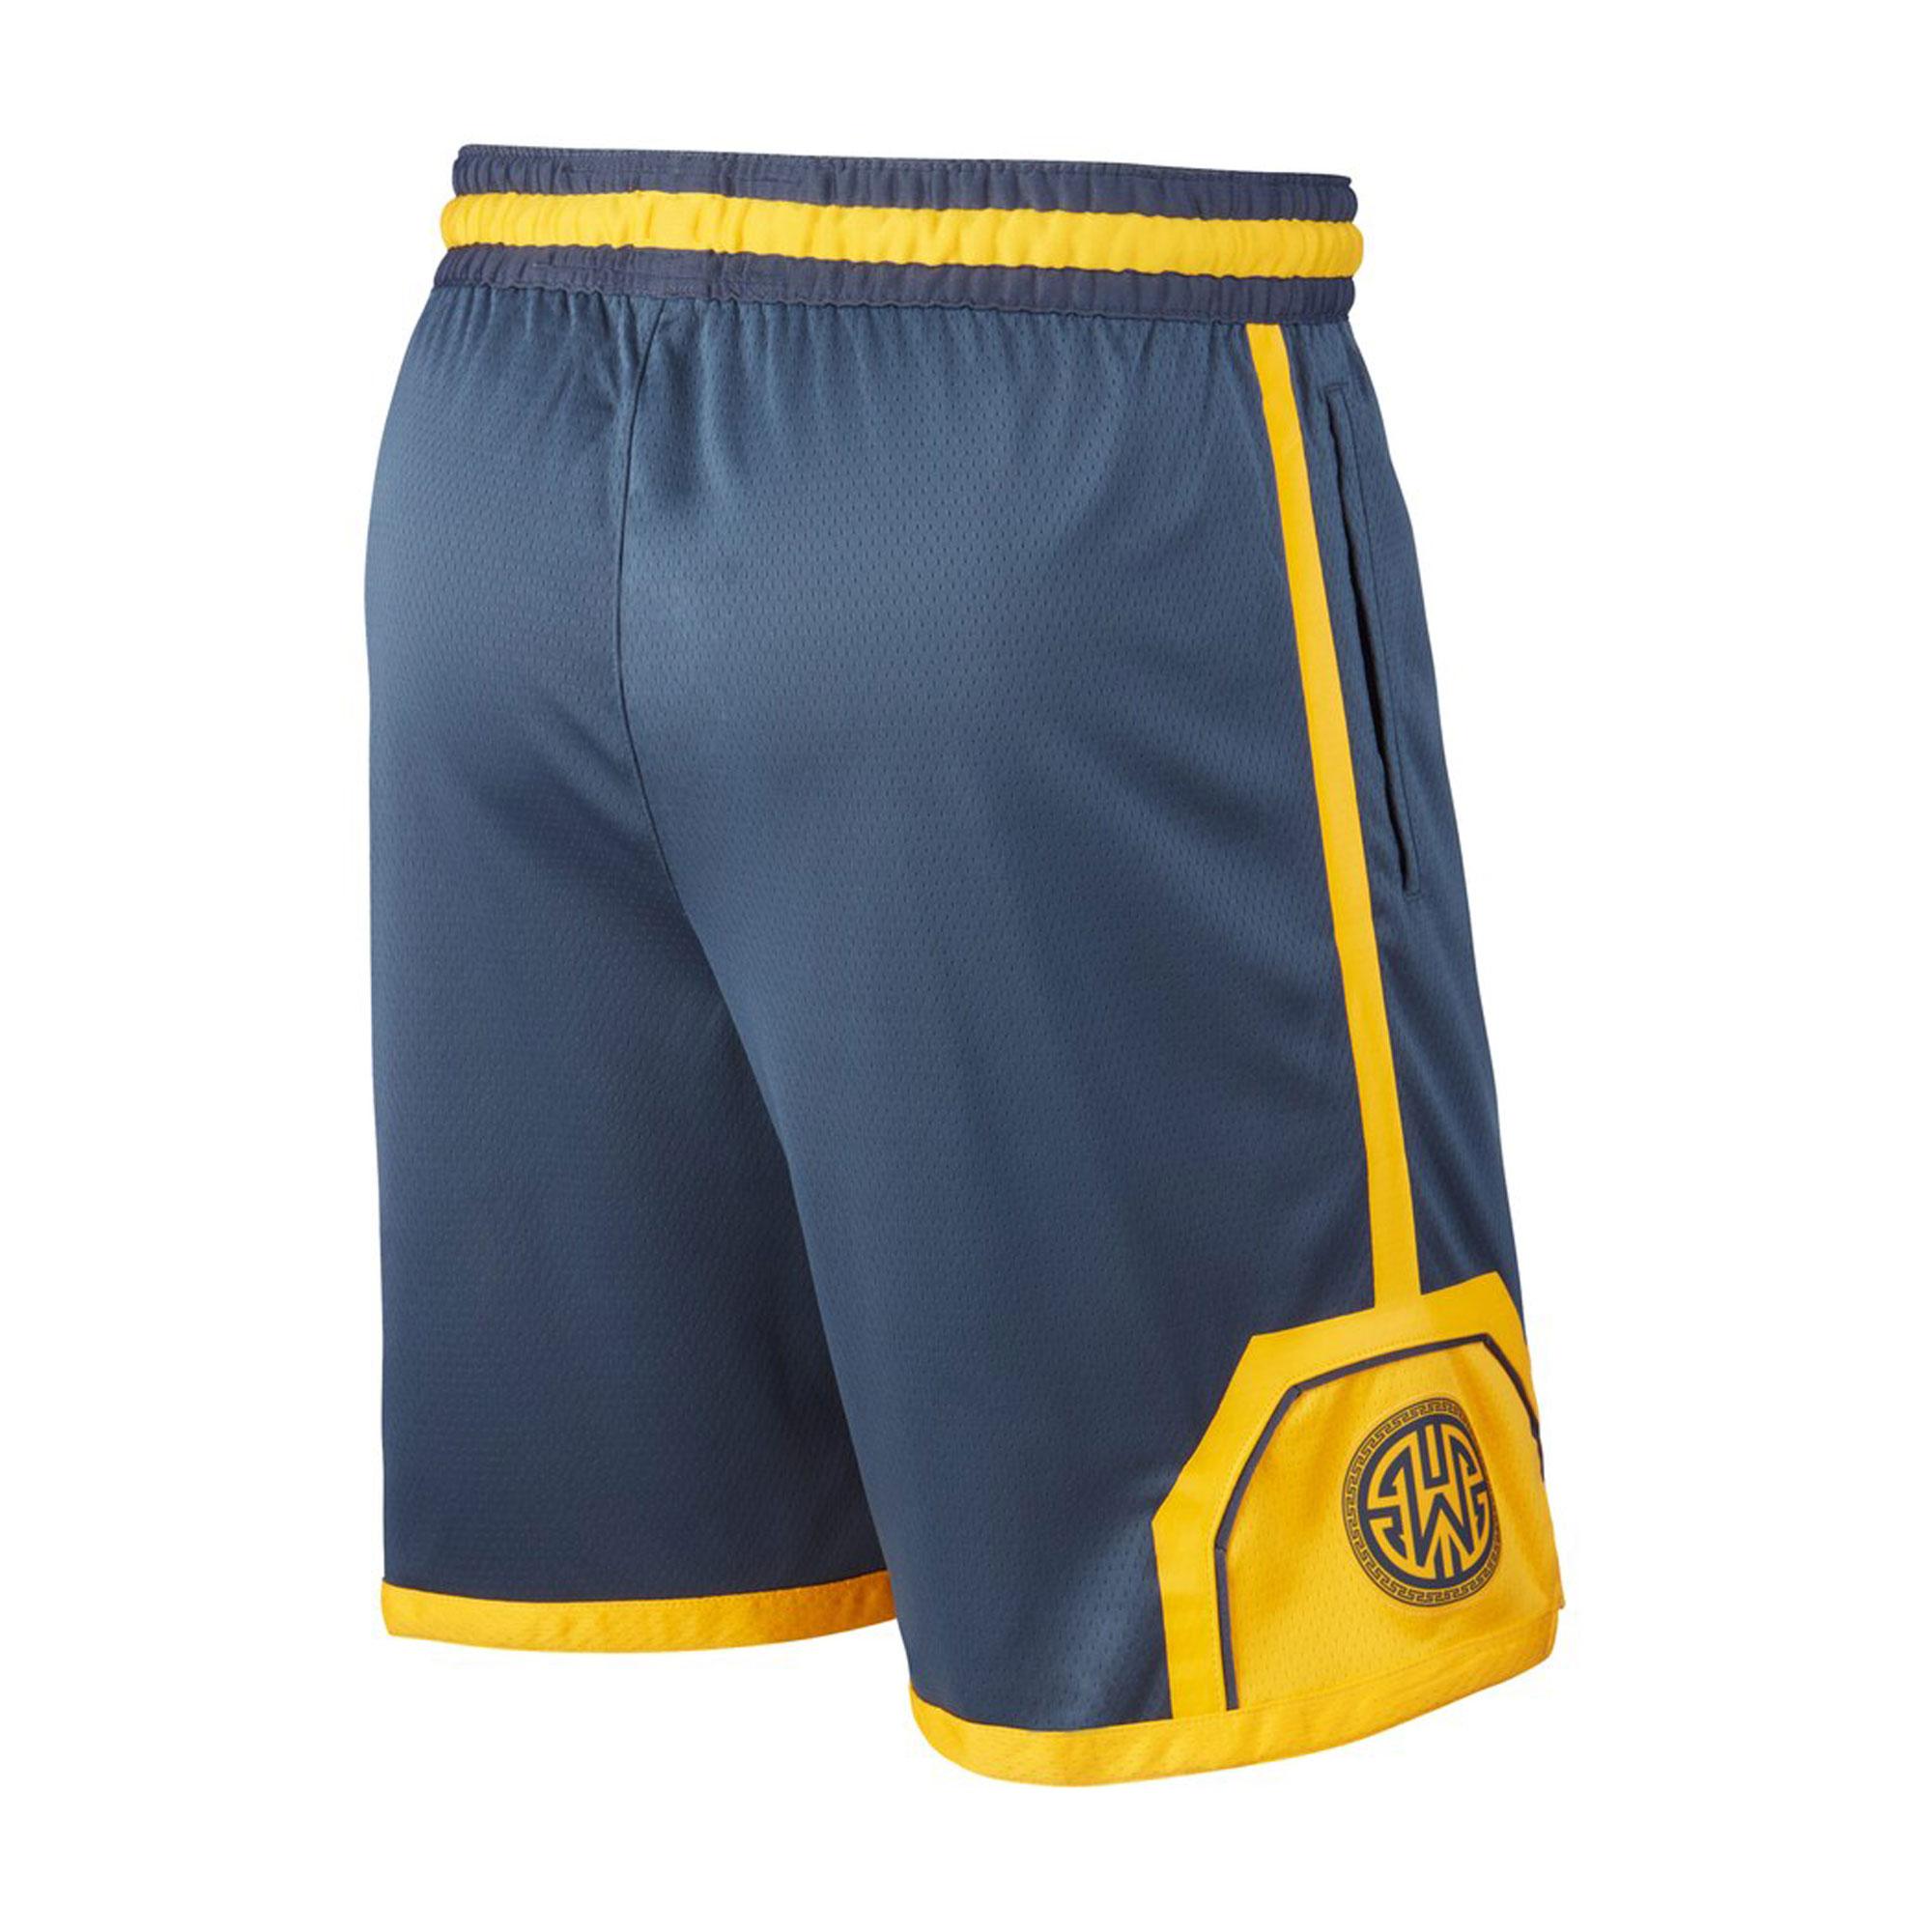 Golden State Warriors Short (SRT-NAVY-GSW)